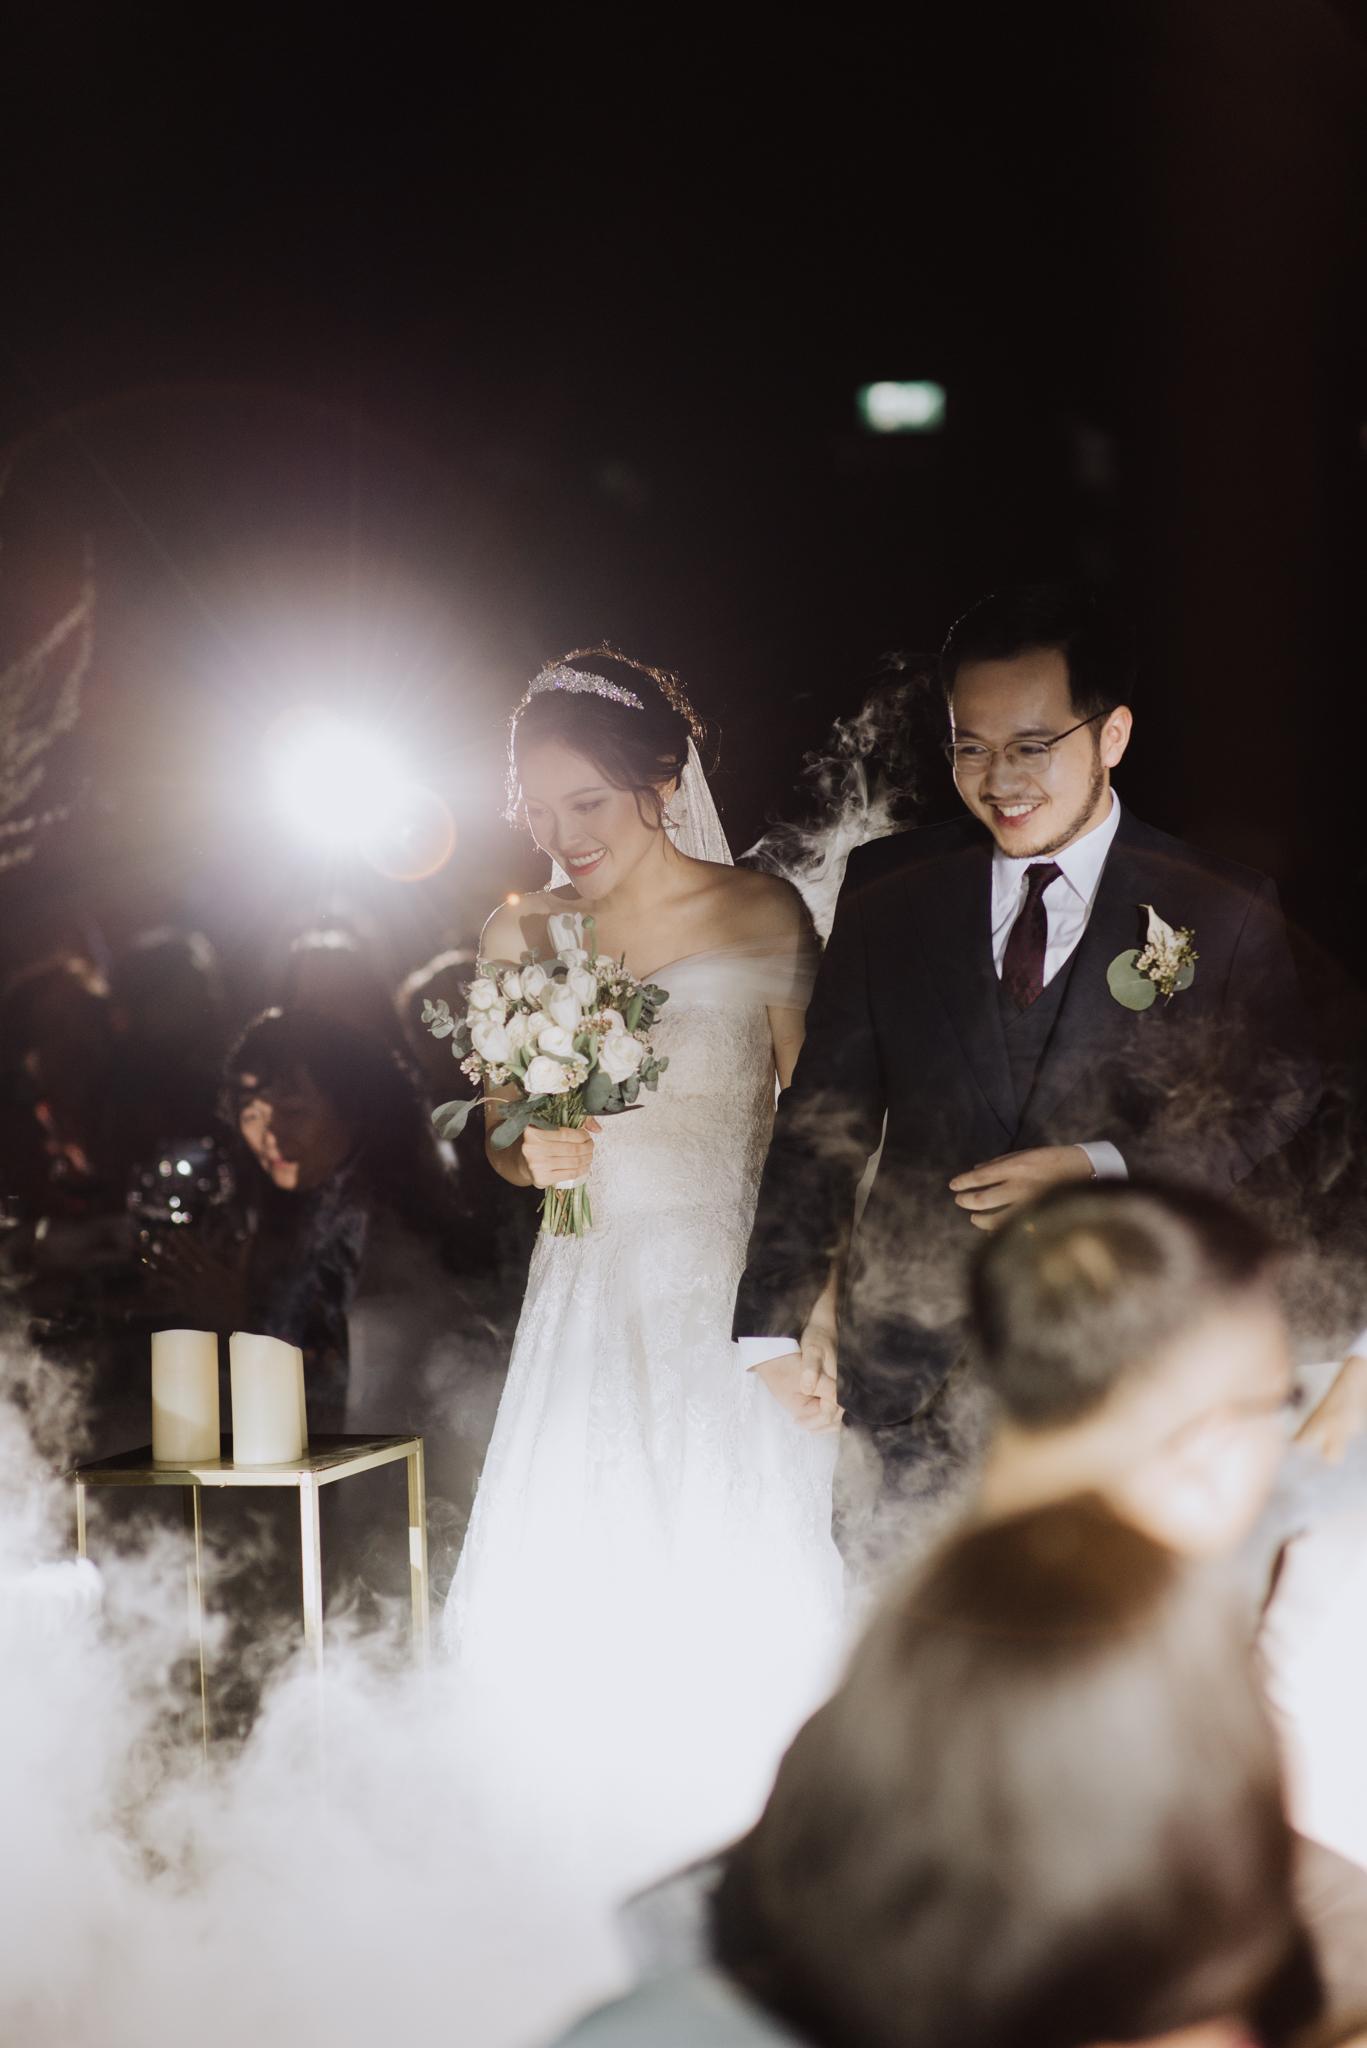 JWMarriott Ha Noi Intimate Wedding of Trang Hi well captured by Hipster Wedding Vietnam Wedding Photographer-4280.jpg